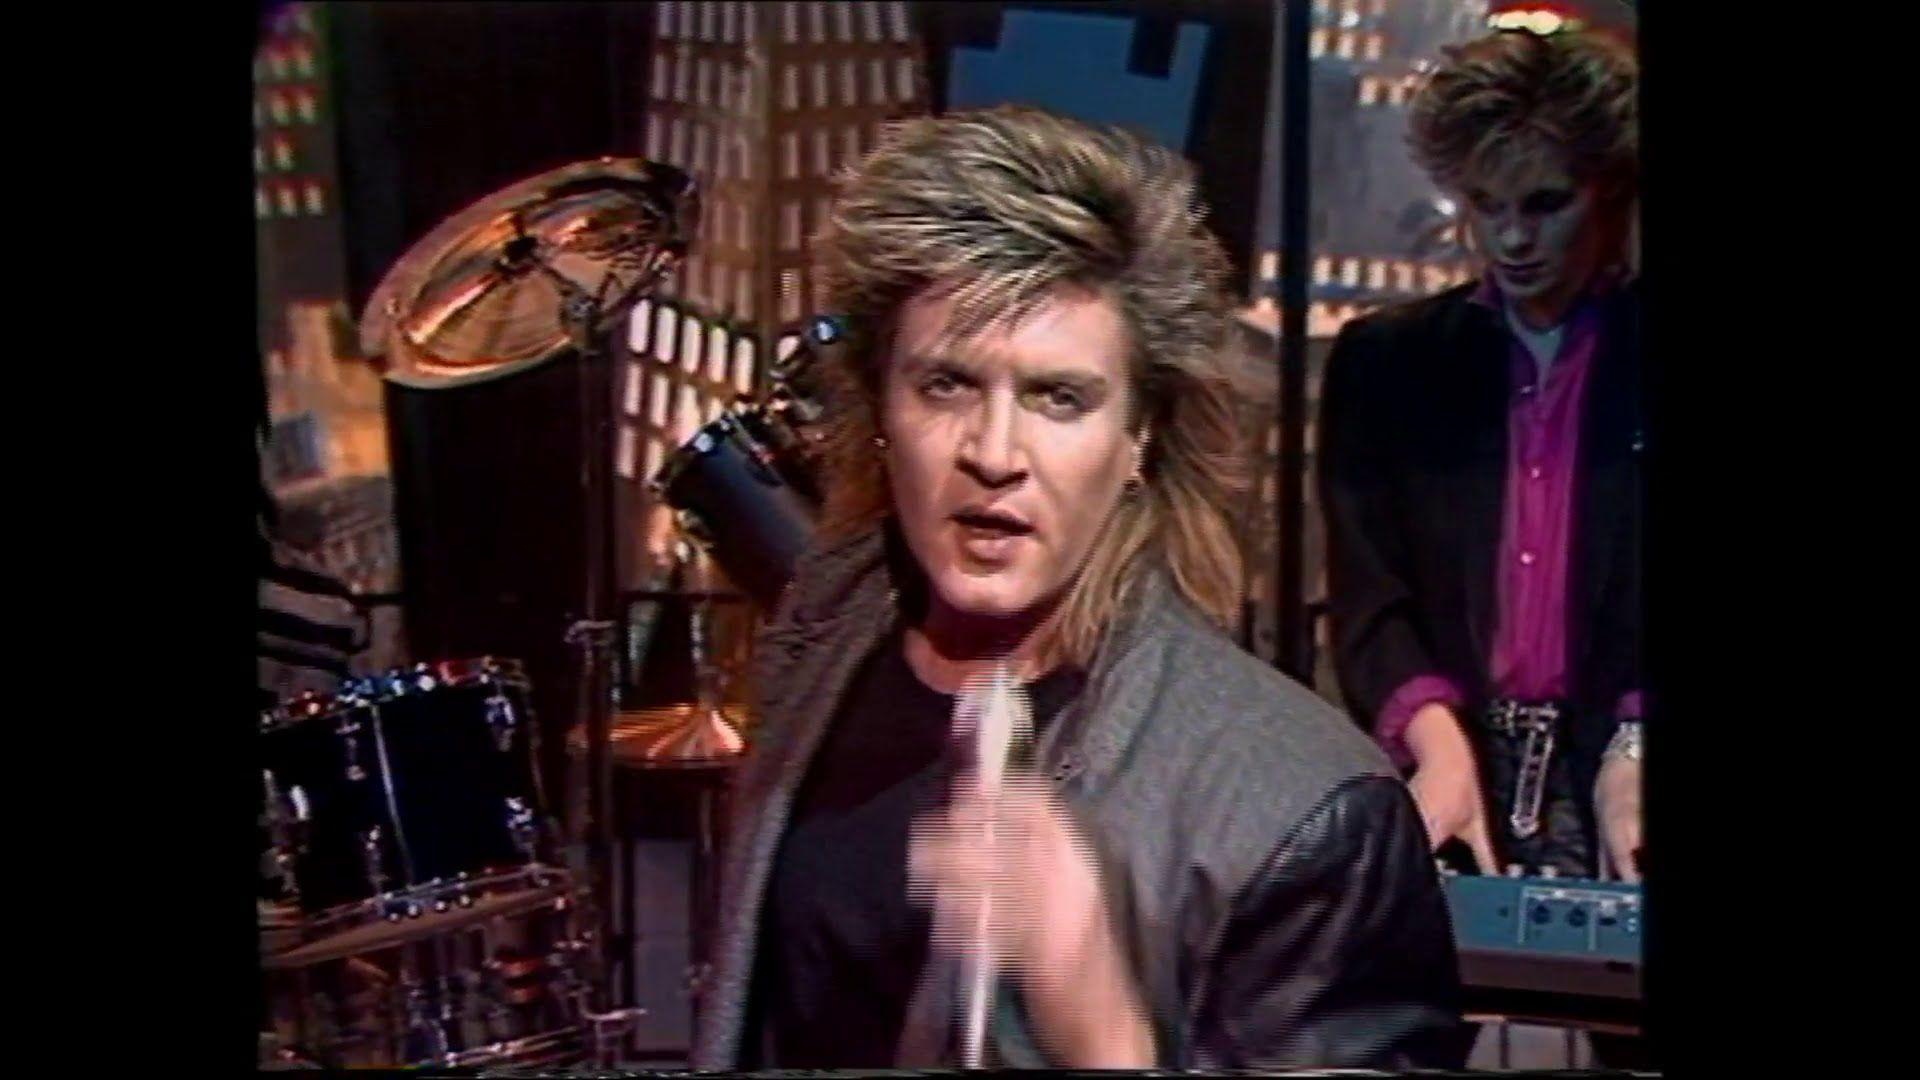 Duran Duran Wild Boys Top Pop 1984 Roger Taylor Duran Duran